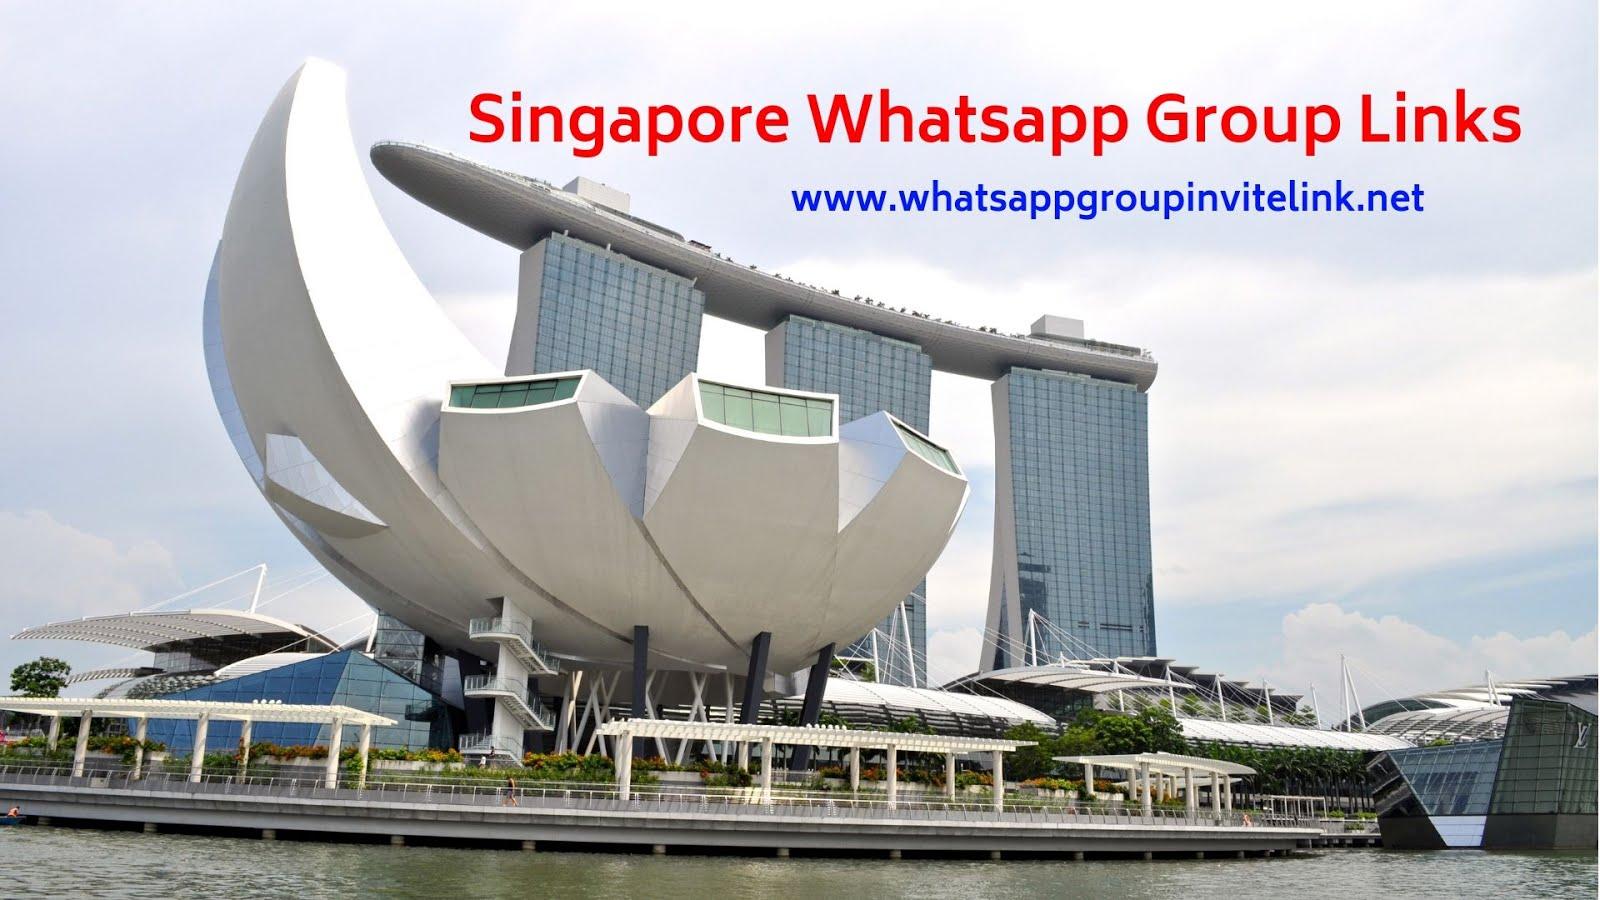 Whatsapp Group Invite Links: Singapore Whatsapp Group Links